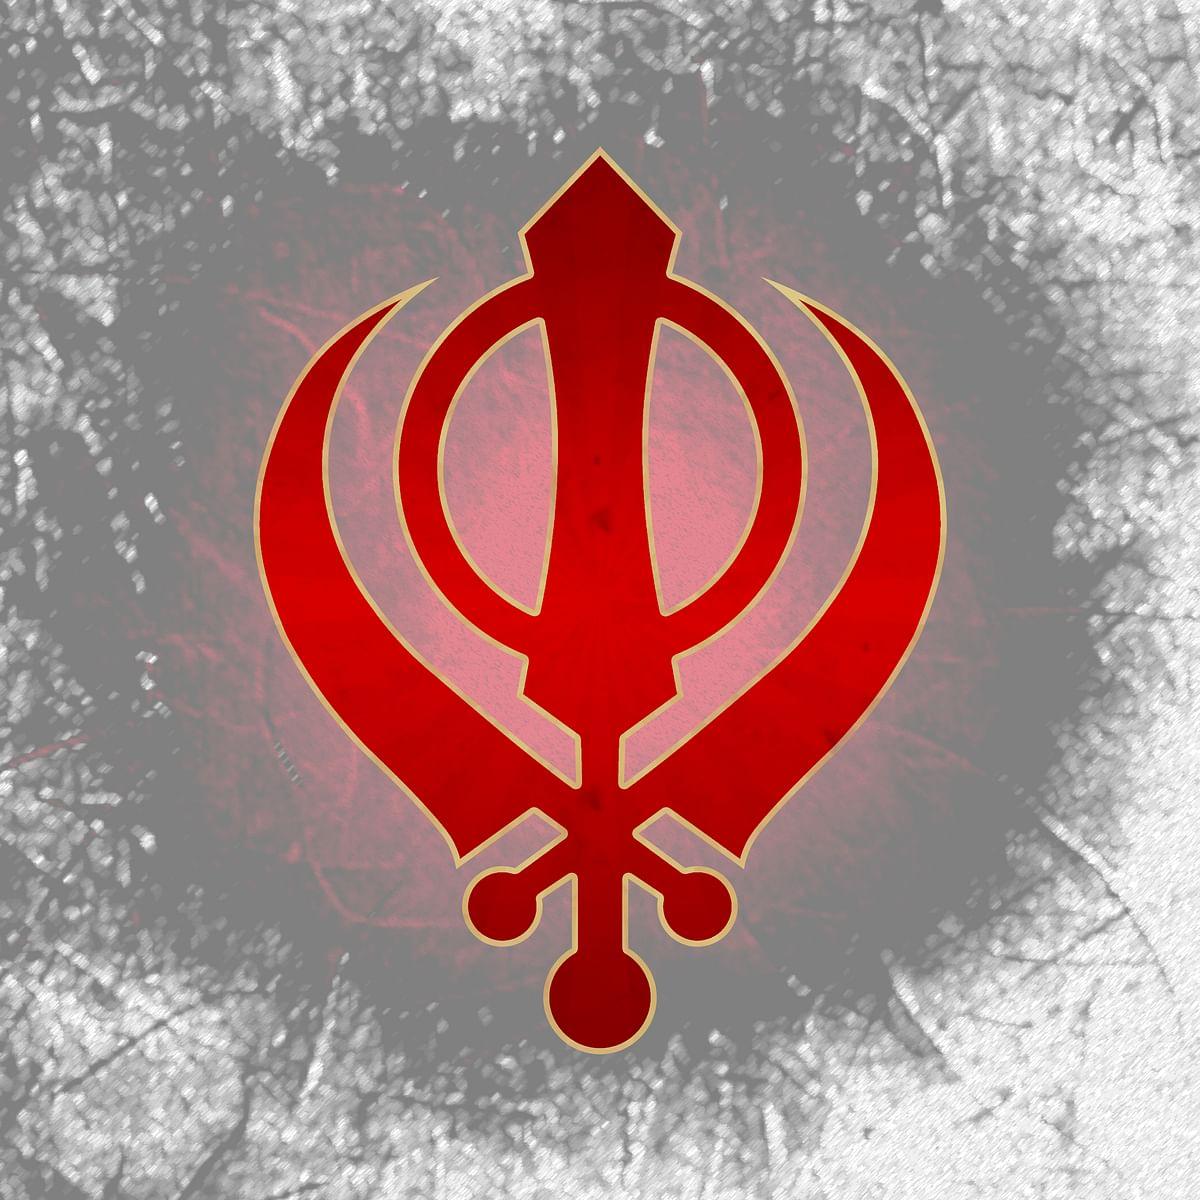 गुरु अर्जन देव जी- Sikh Guru Arjan Dev